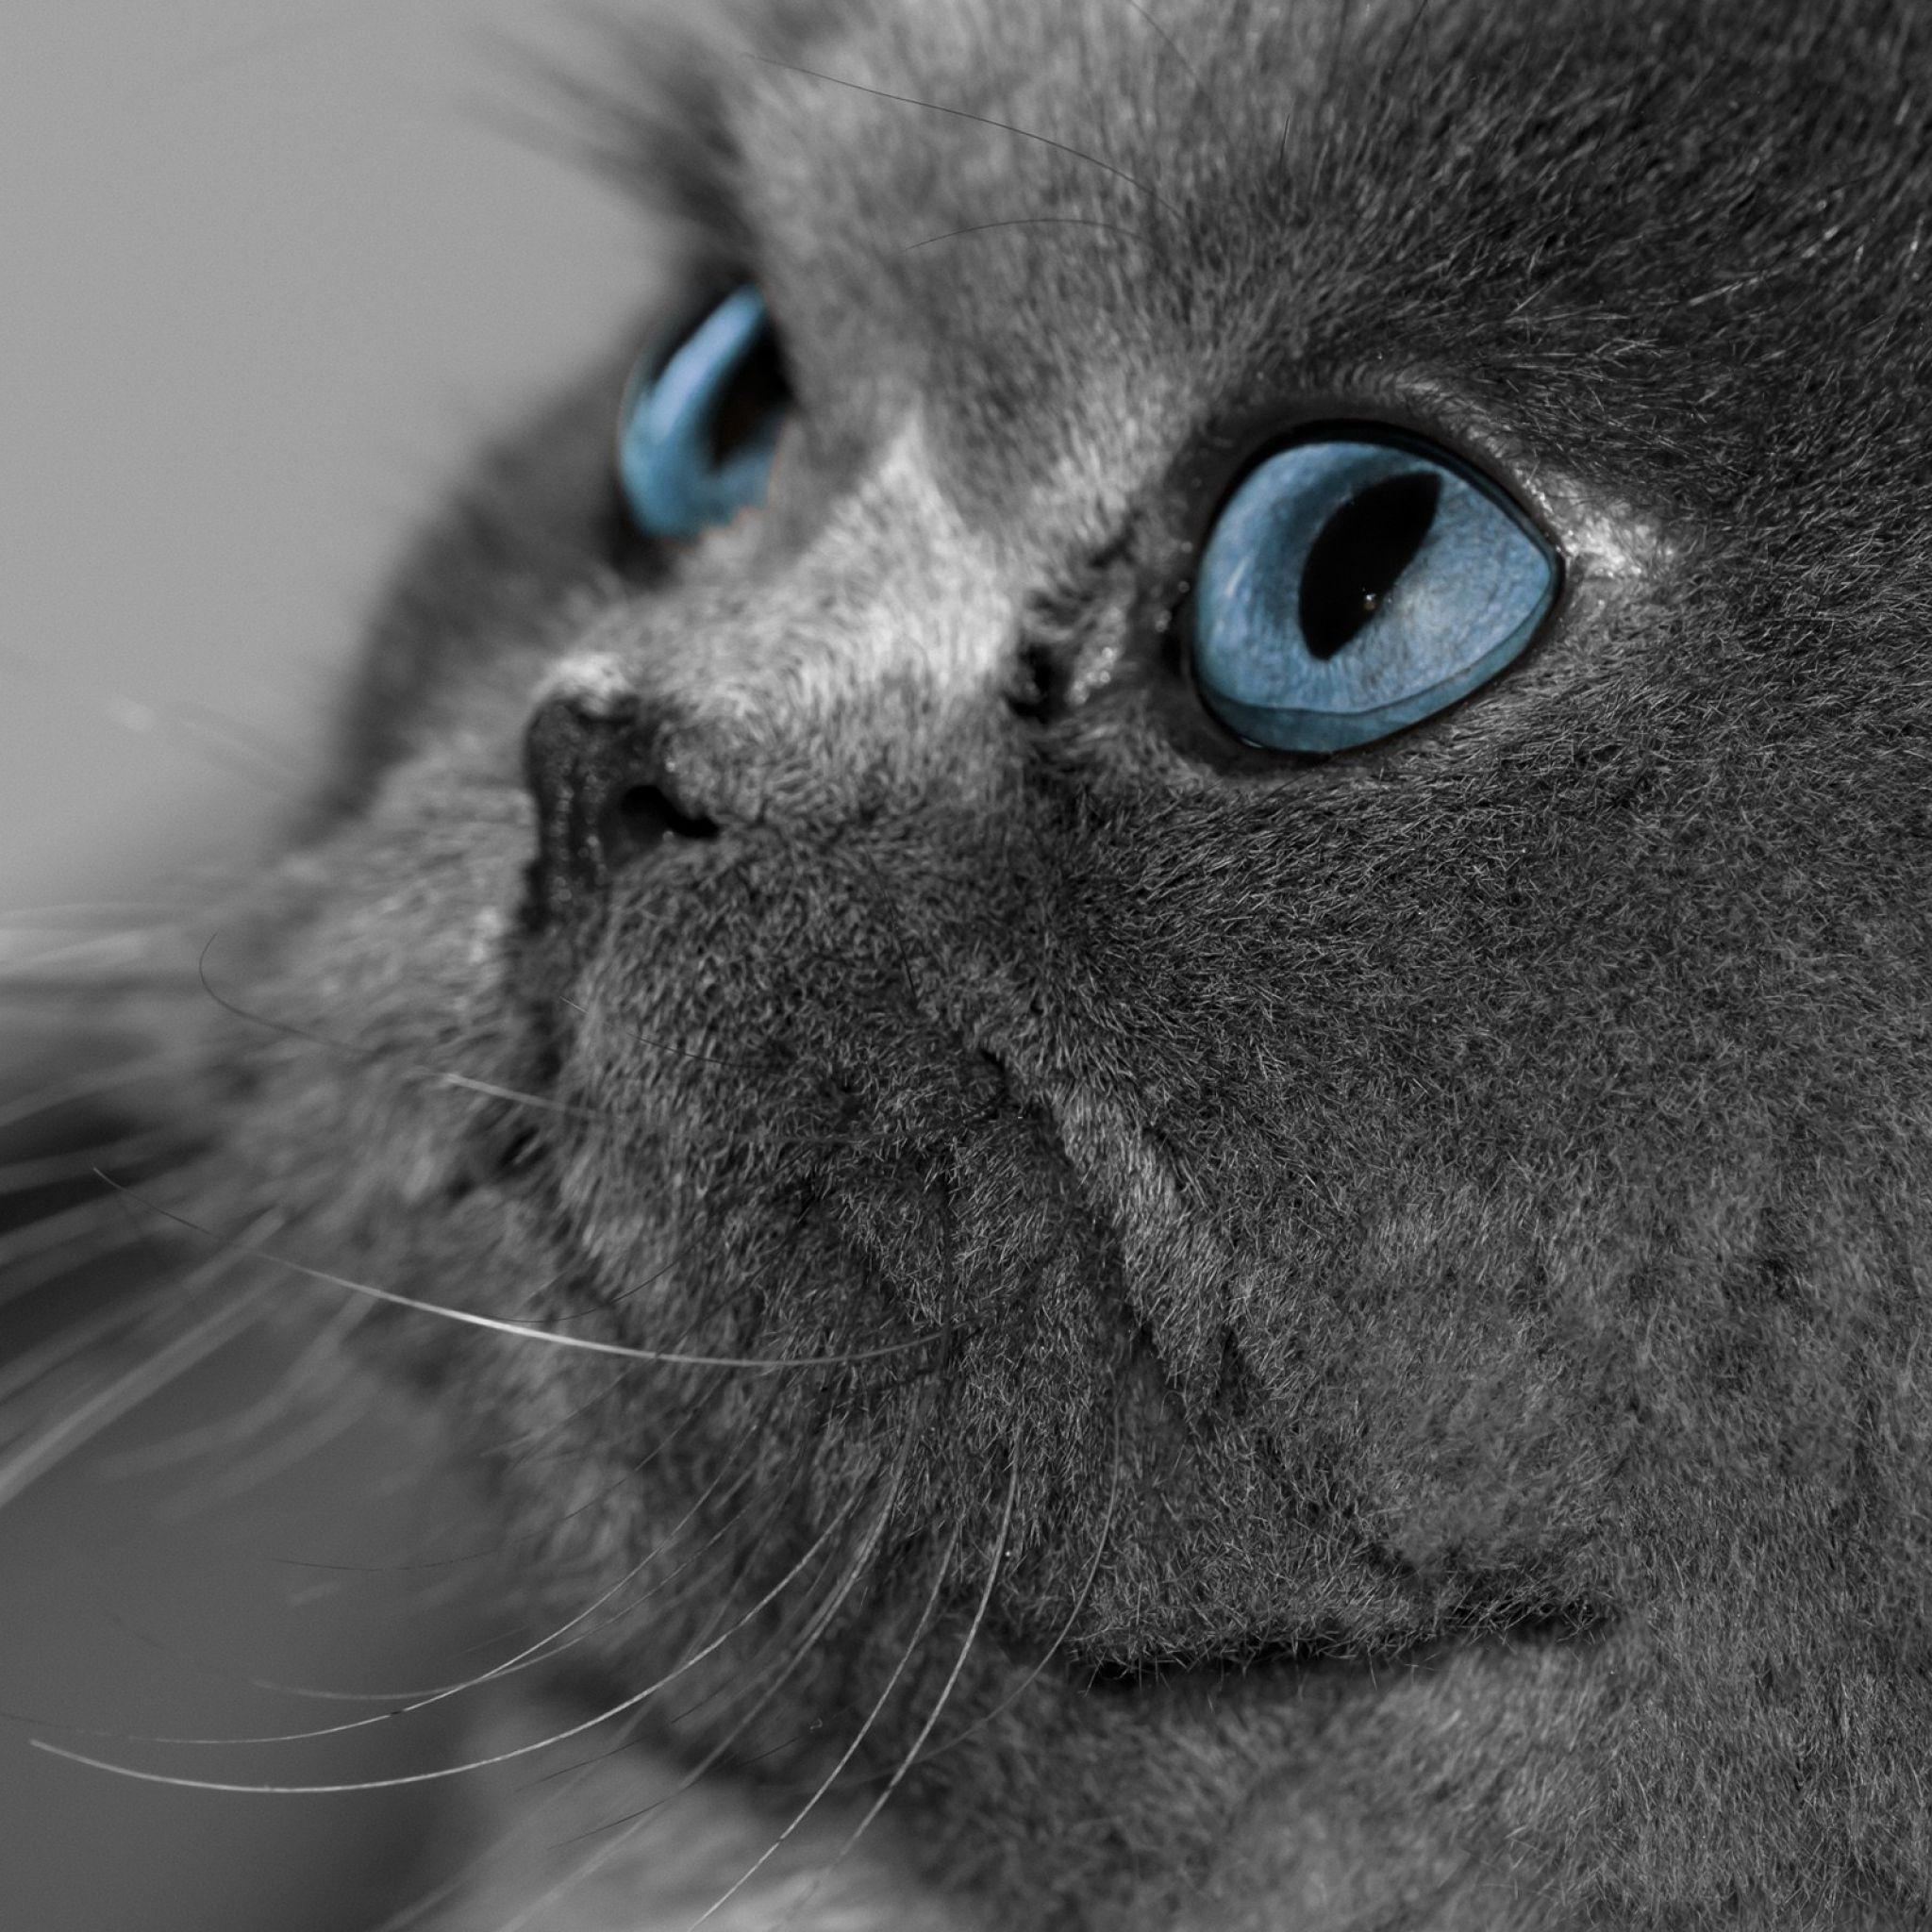 Download Wallpaper 2048x2048 Cat Fluffy Gray Eyes Blue Eyes Profile New Ipad Air 4 3 Ipad Mini Retina H Cat With Blue Eyes Grey Cat Wallpaper Grey Cats